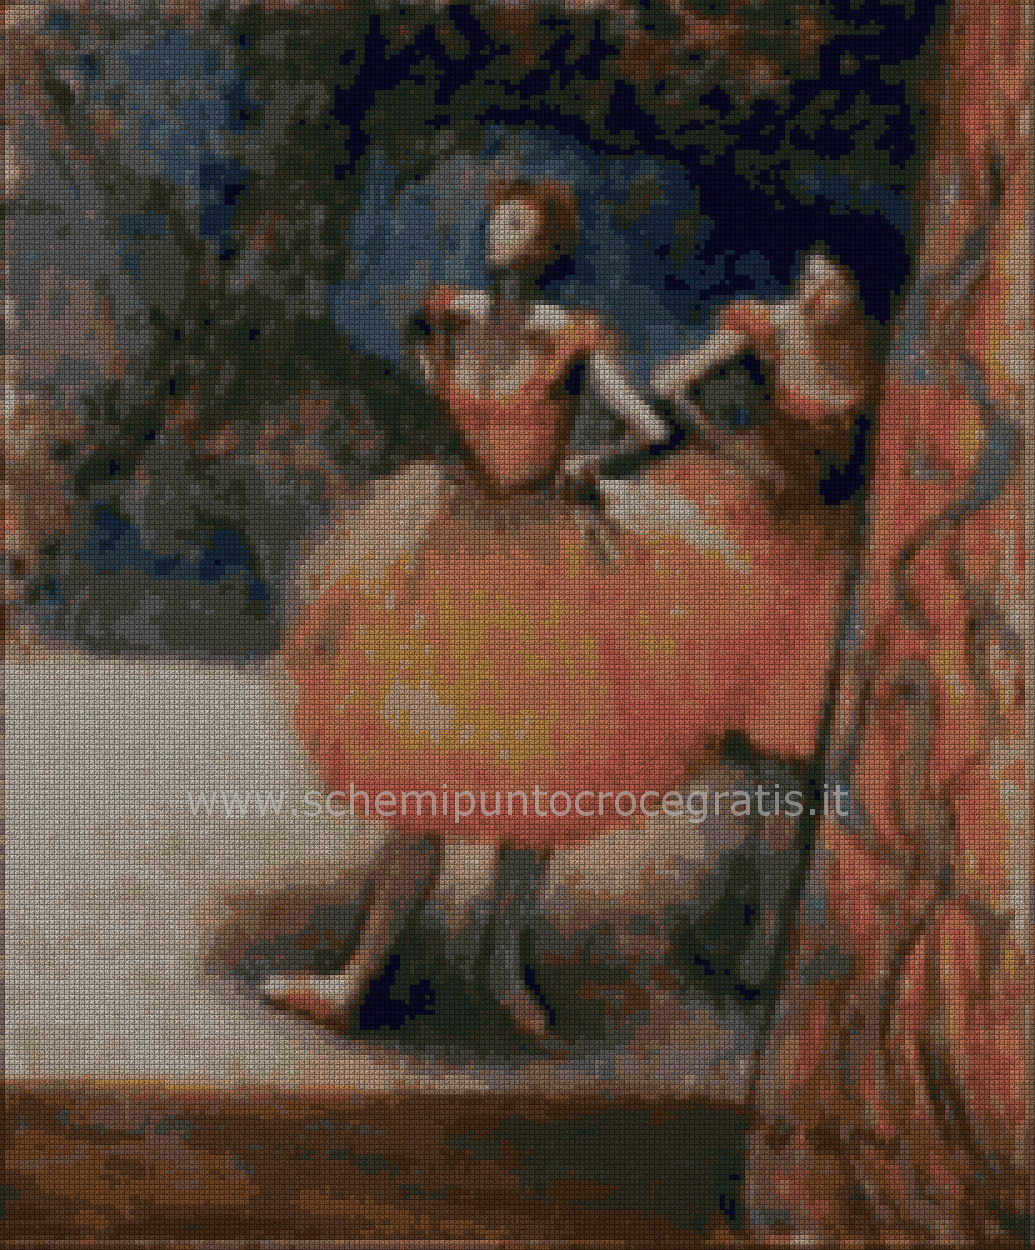 pittori_moderni/degas/degas01.jpg